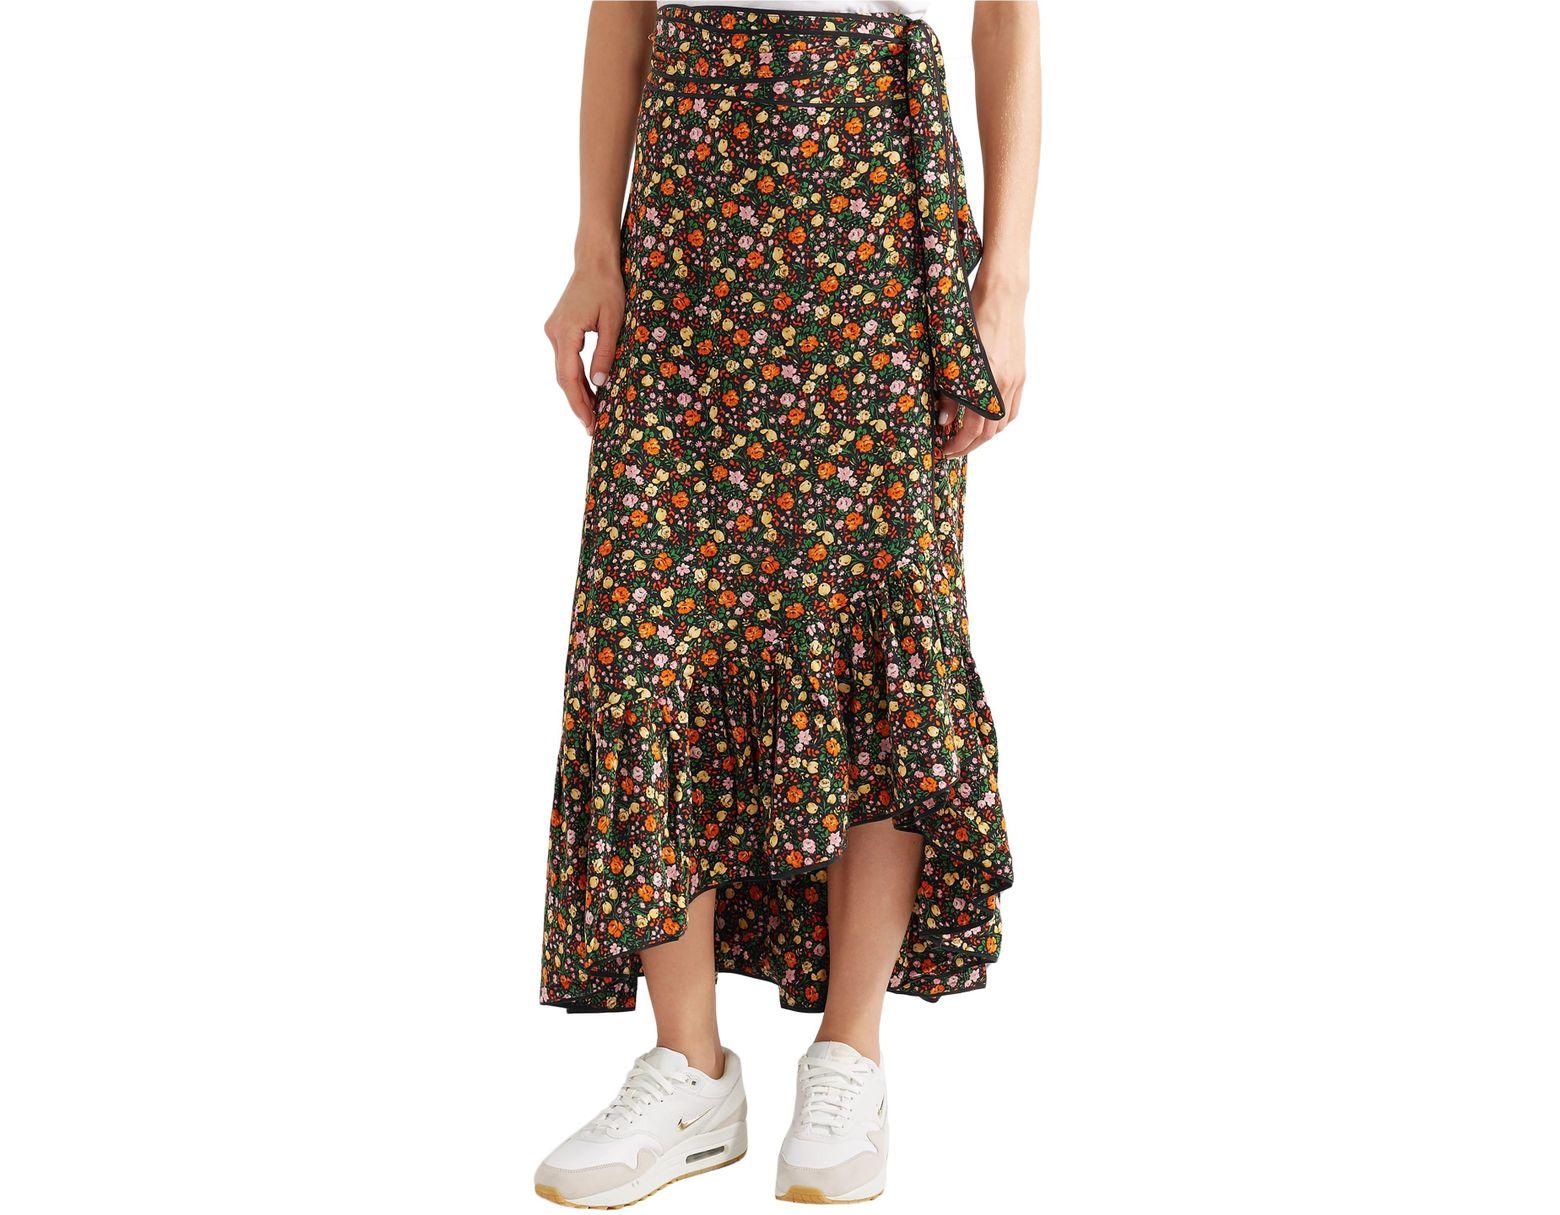 5f3c6eb61f Ganni Ruffled Floral-print Silk Crepe De Chine Midi Wrap Skirt Multicolor -  Lyst